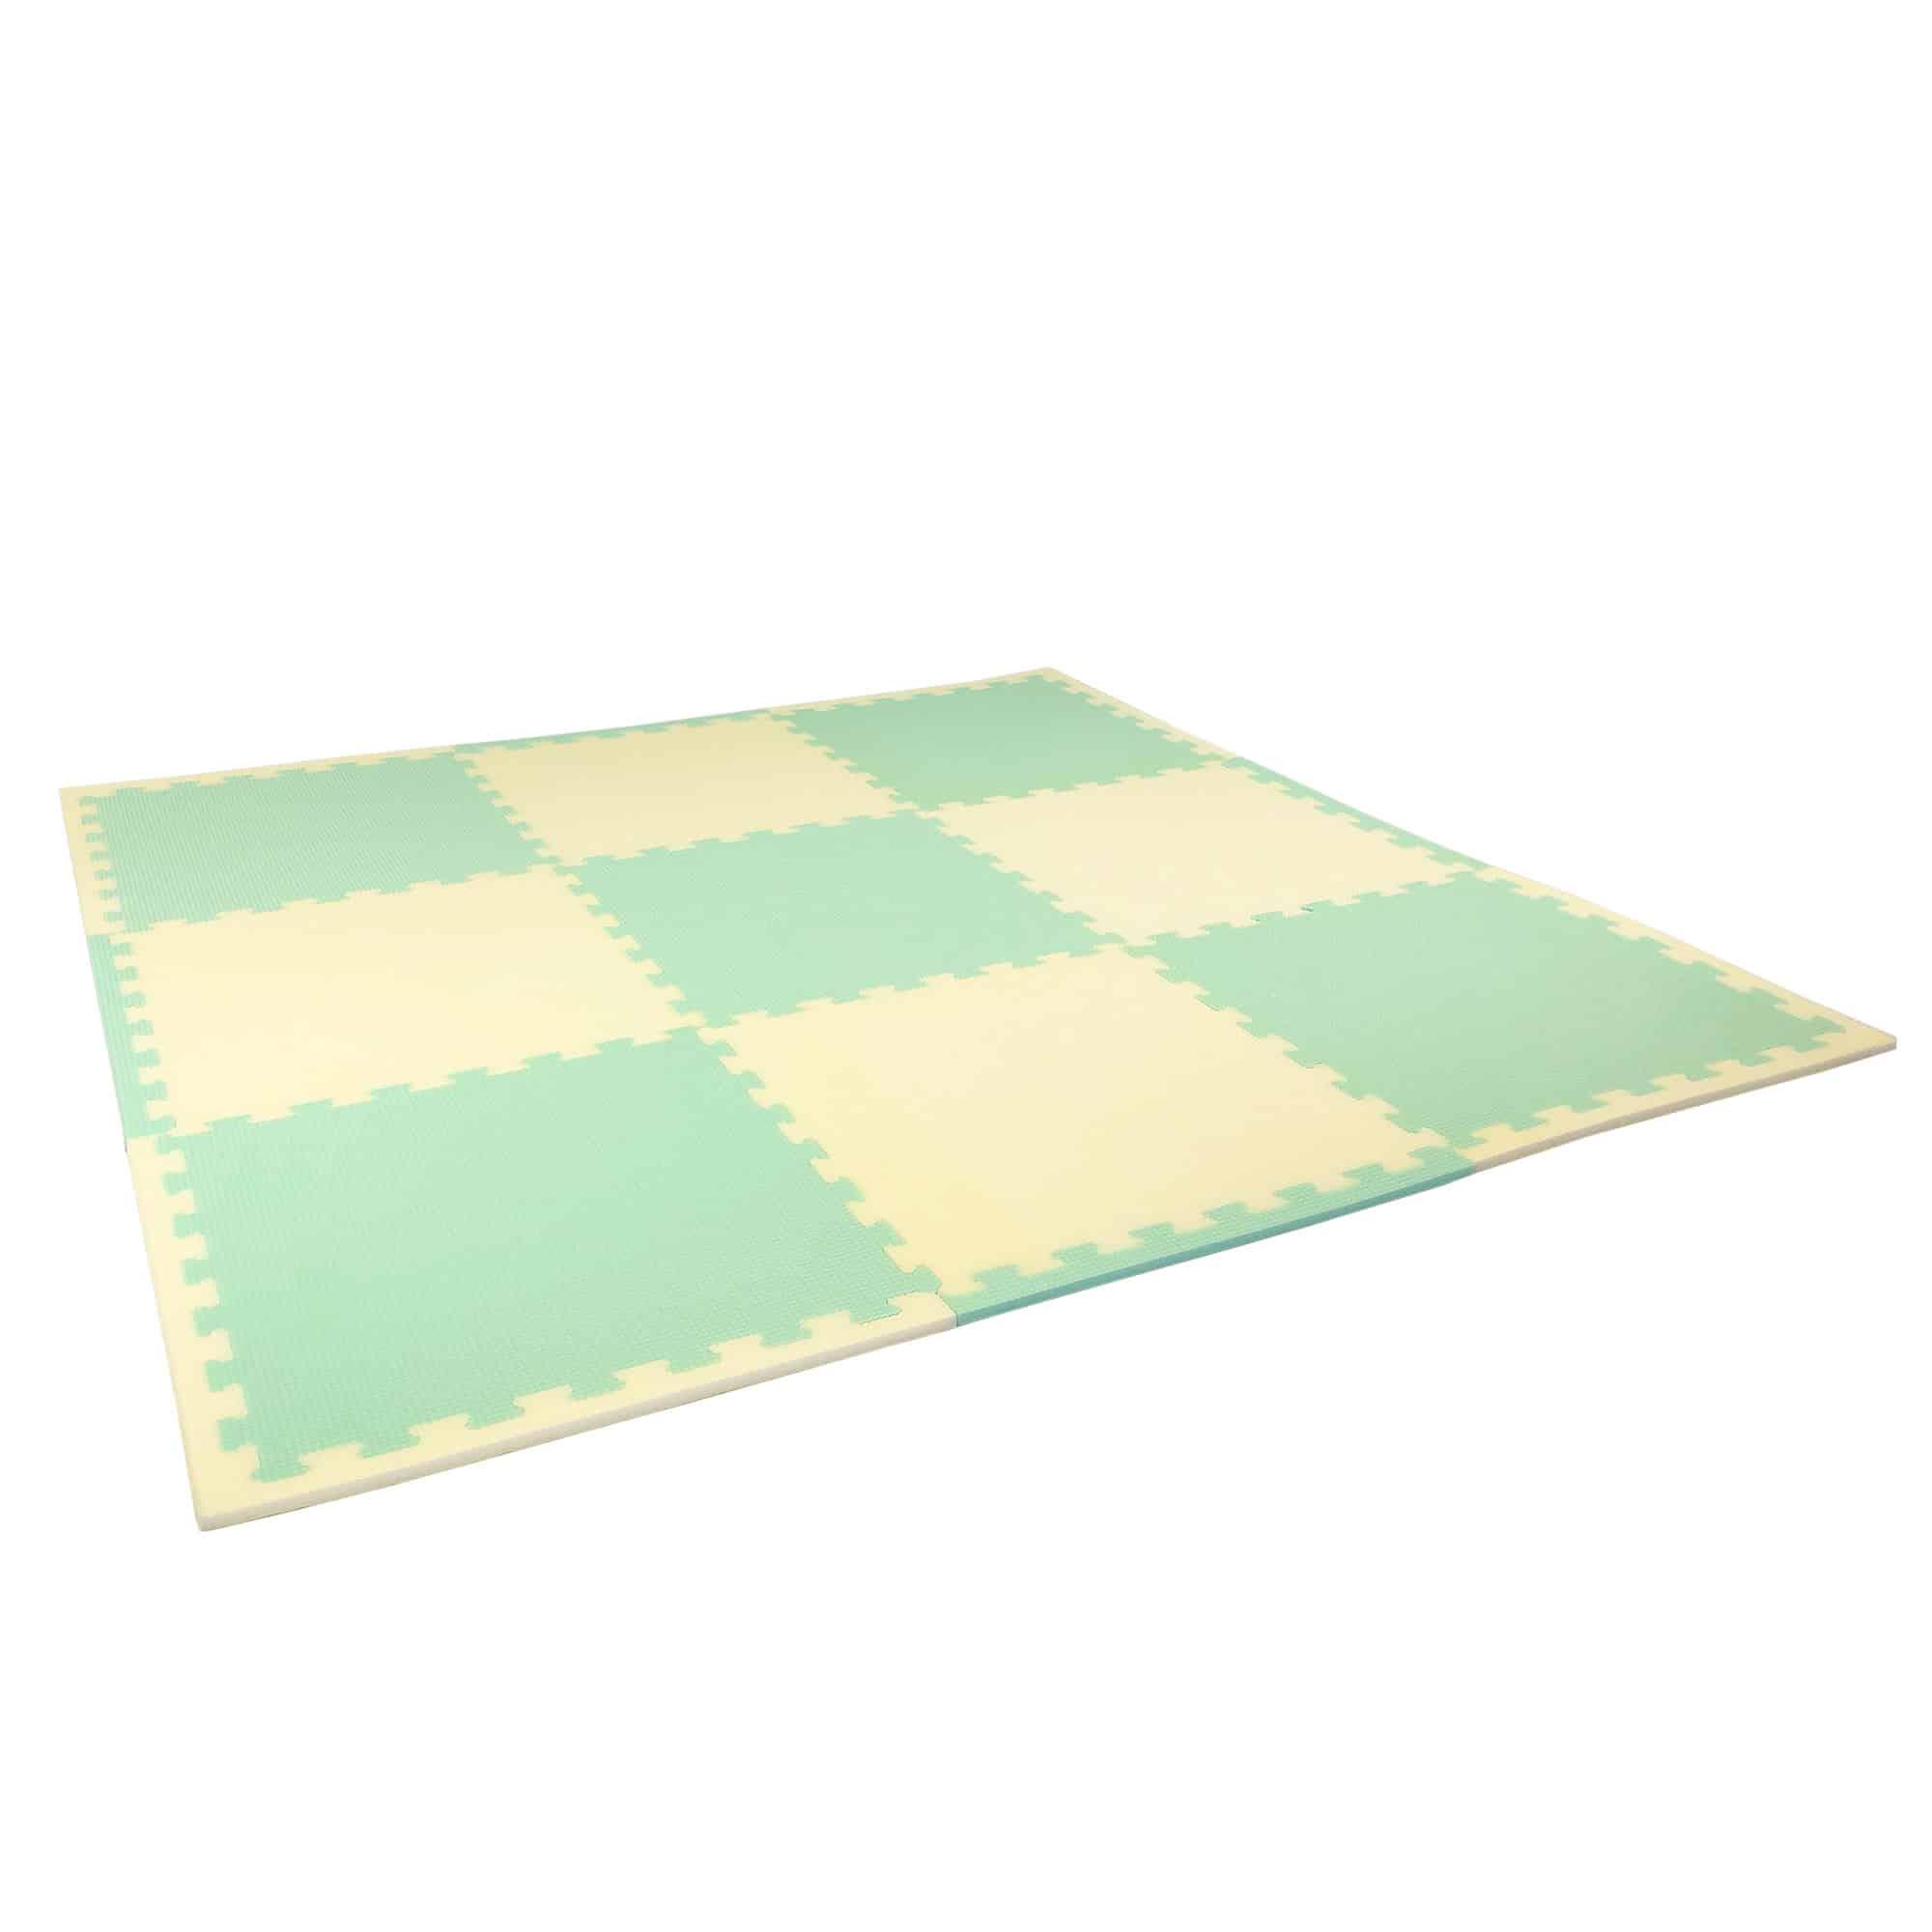 Tiny Tales Lily Pads soft foam playmats